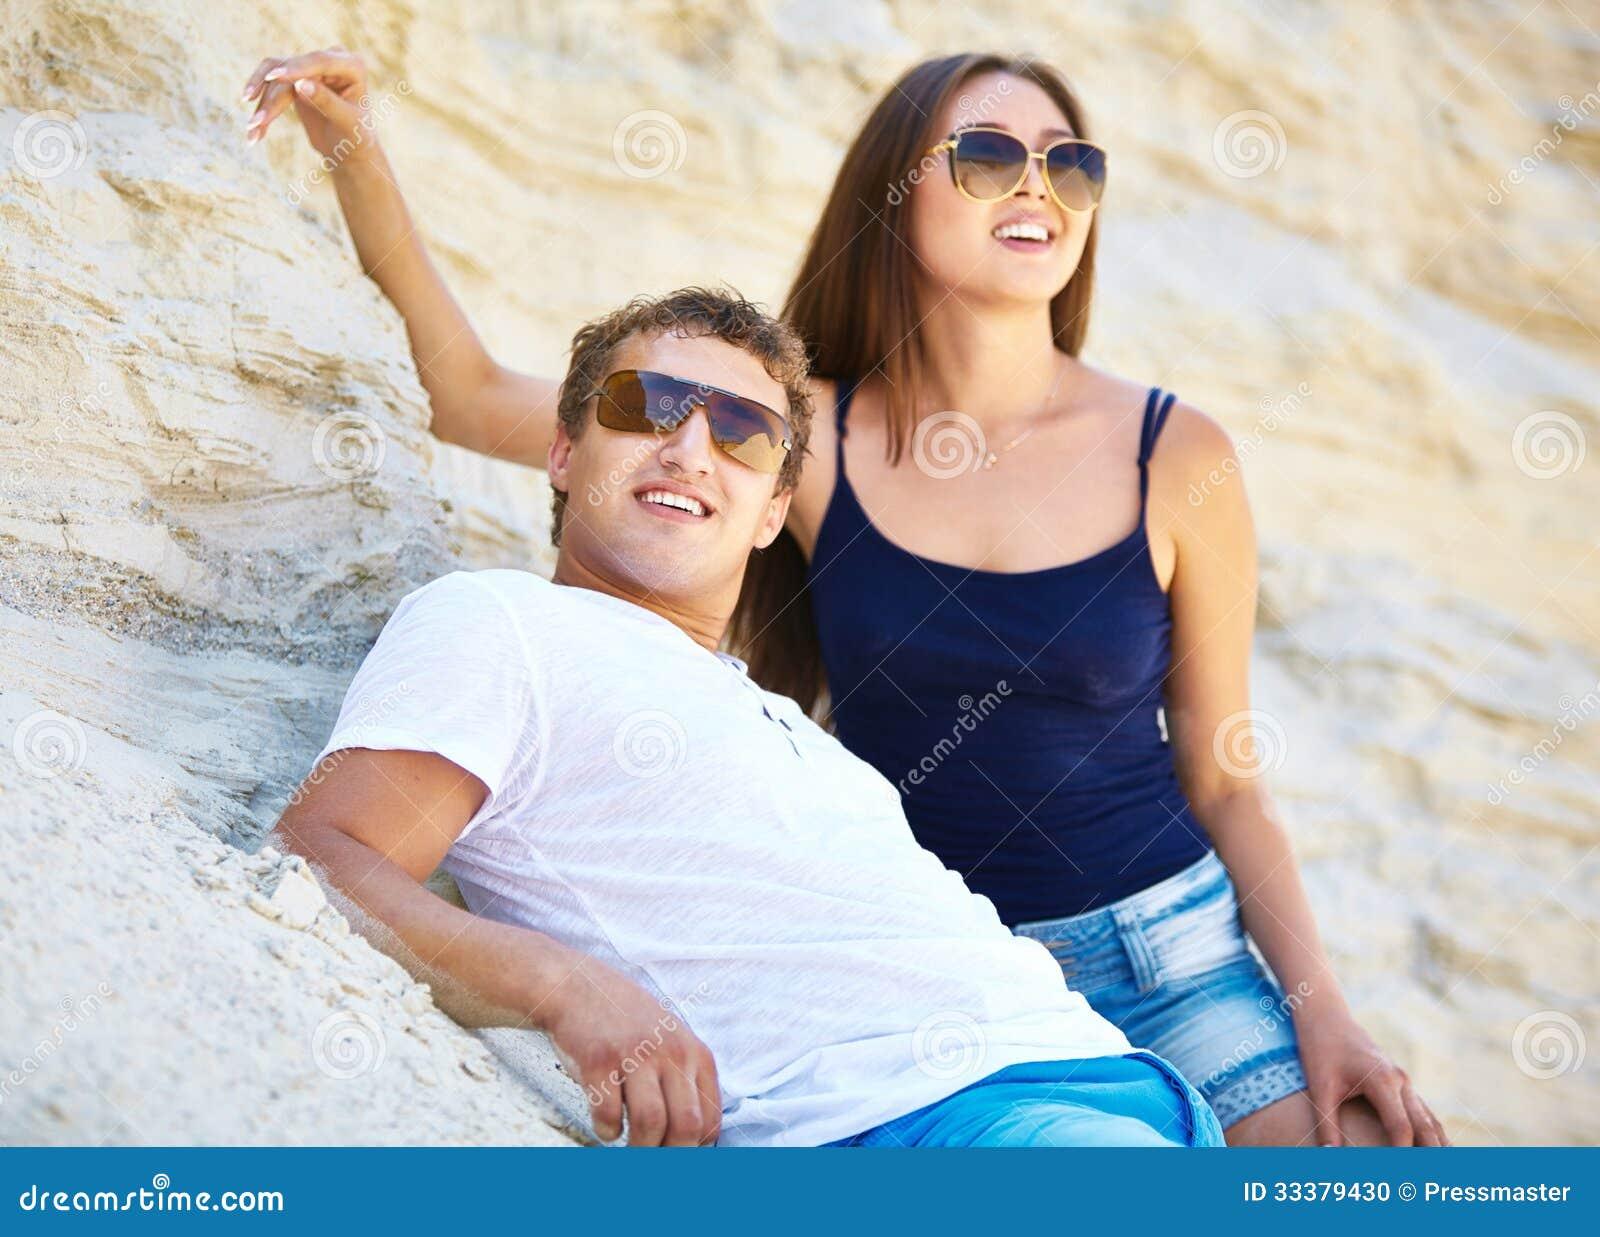 Beach Friends Stock Photo - Image: 33379430